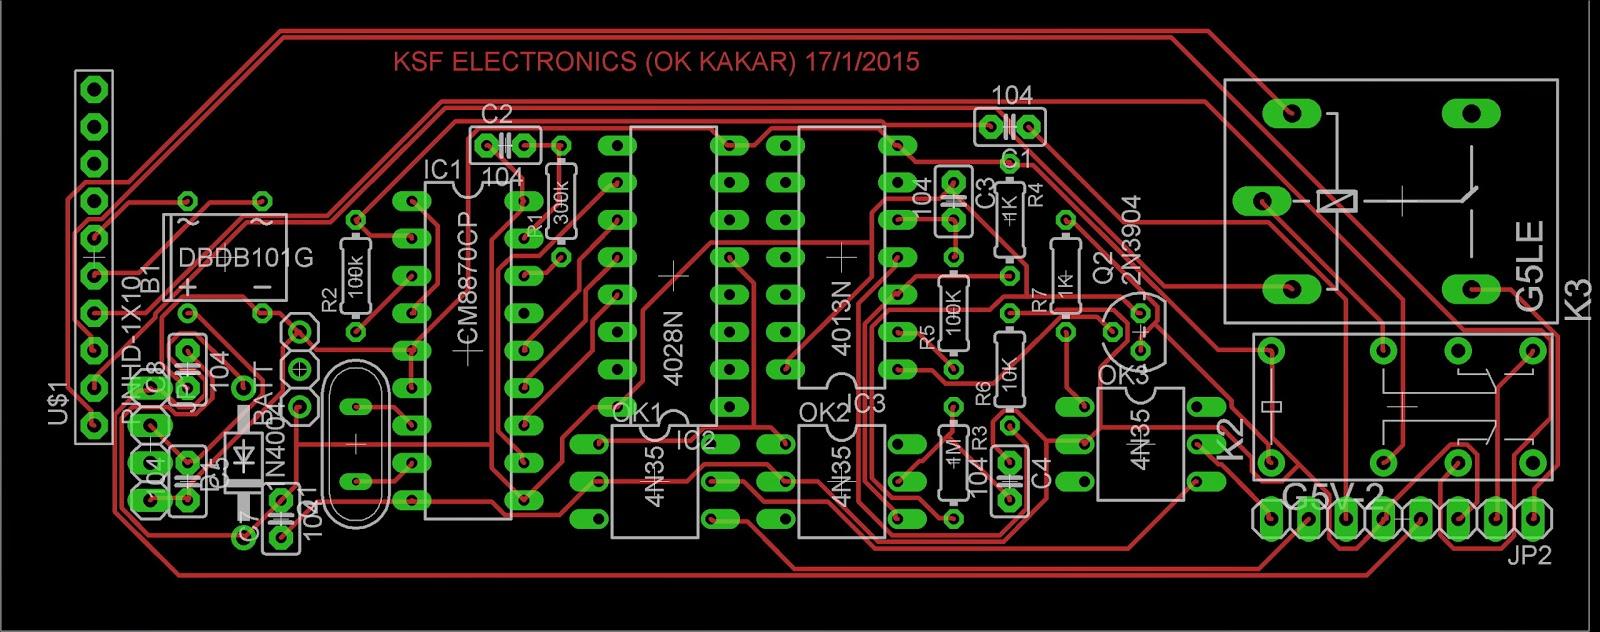 Bluetooth fm transmitter: MY ELECTRONIC CIRCUITS